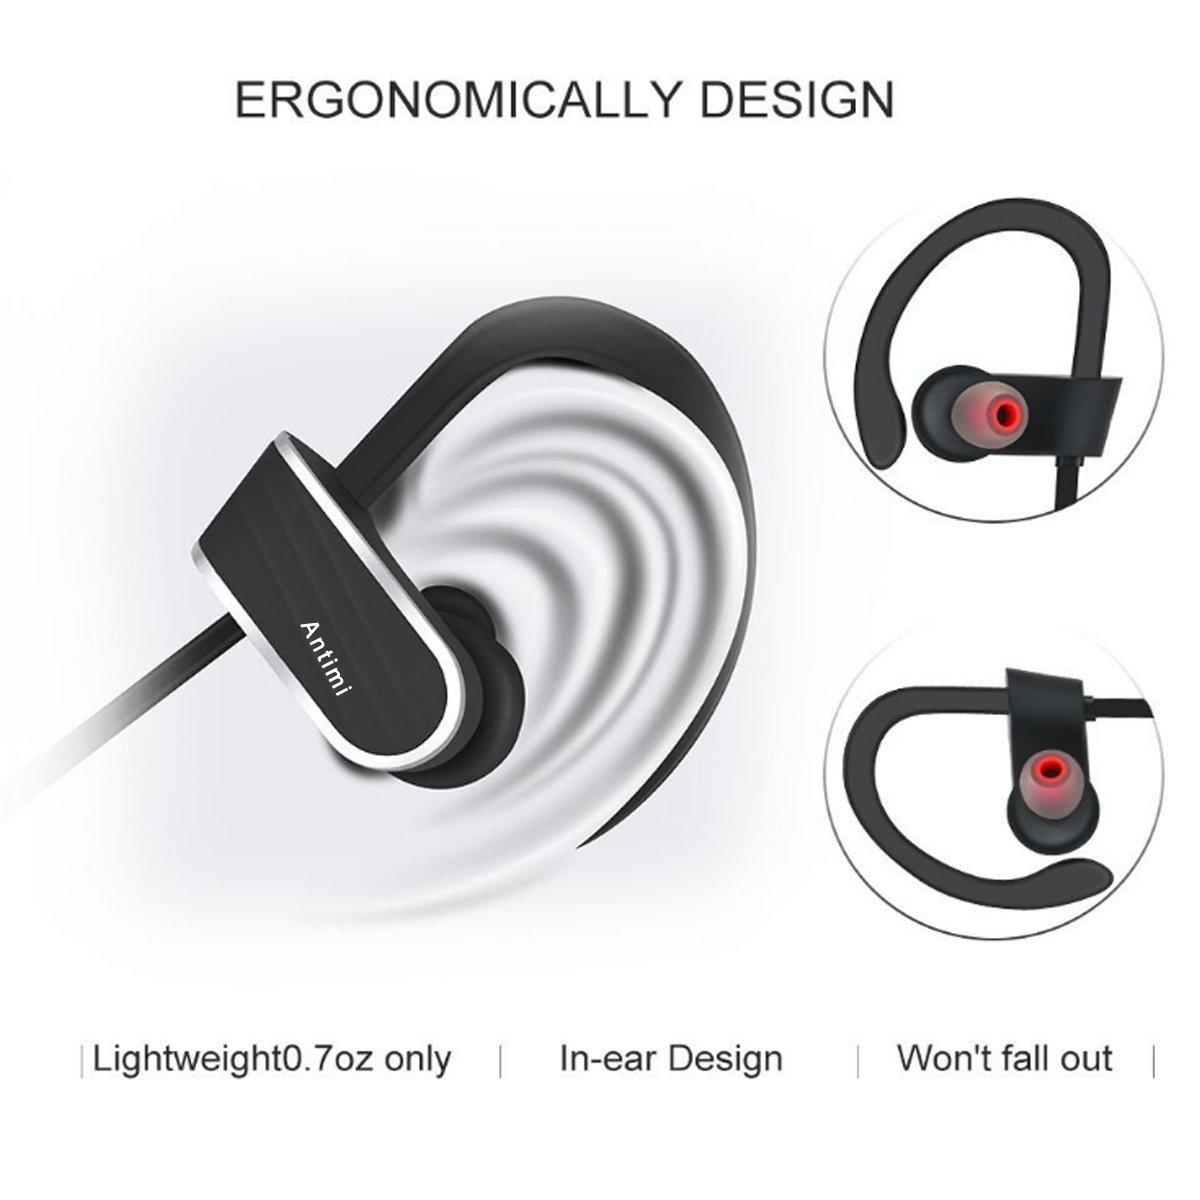 Antimi Auriculares Bluetooth Inalámbricos con micrófonos Headphones In Ear Wirelesspara Apple iPhone 6, 6s, 7 Plus Samsung Sony Huawei Movil, PC, ...